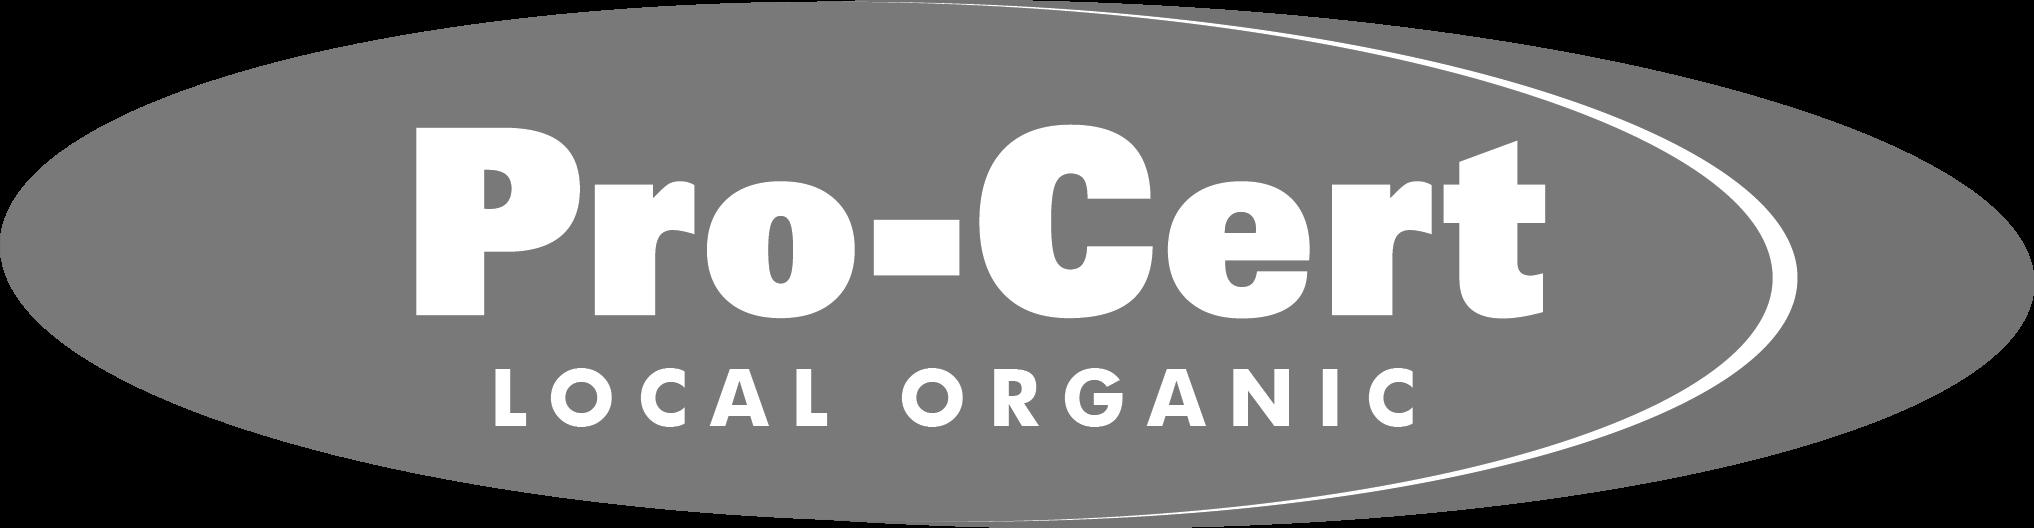 Pro-Cert LOC Logo -No Province - Gray.png